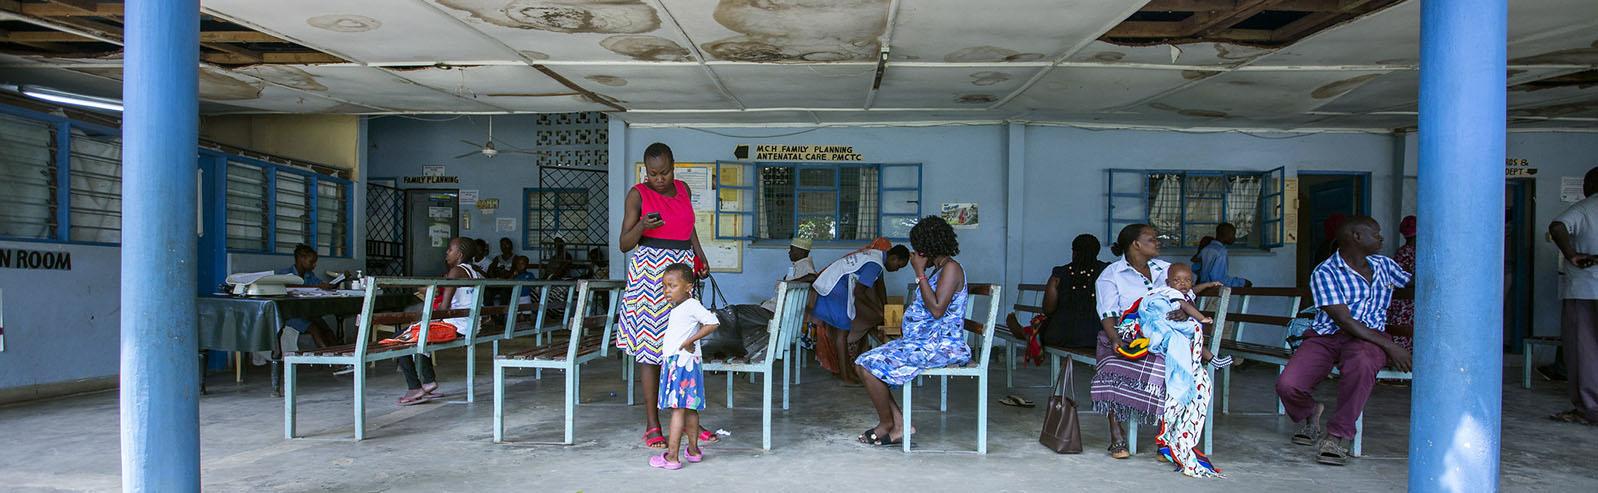 Free maternity care clinic in Mombasa, Kenya. Credit: Arete / Albert Gonzalez Farran for HP+, Flikr